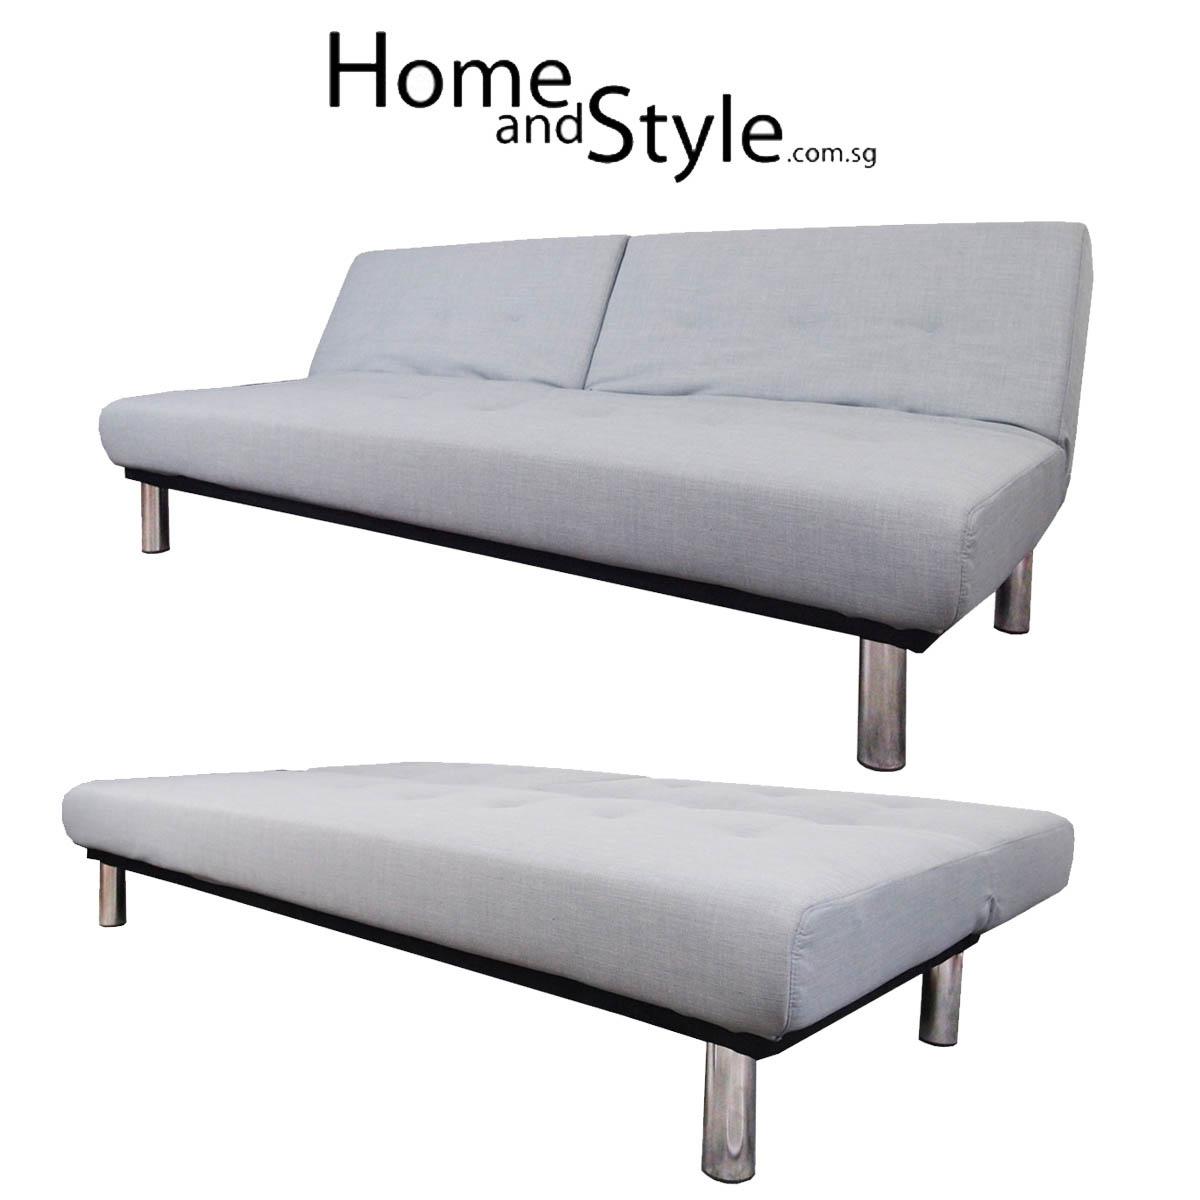 Sofa Bed Qoo10: SALE Everton Designer SOFA BED. 1 Year Warranty